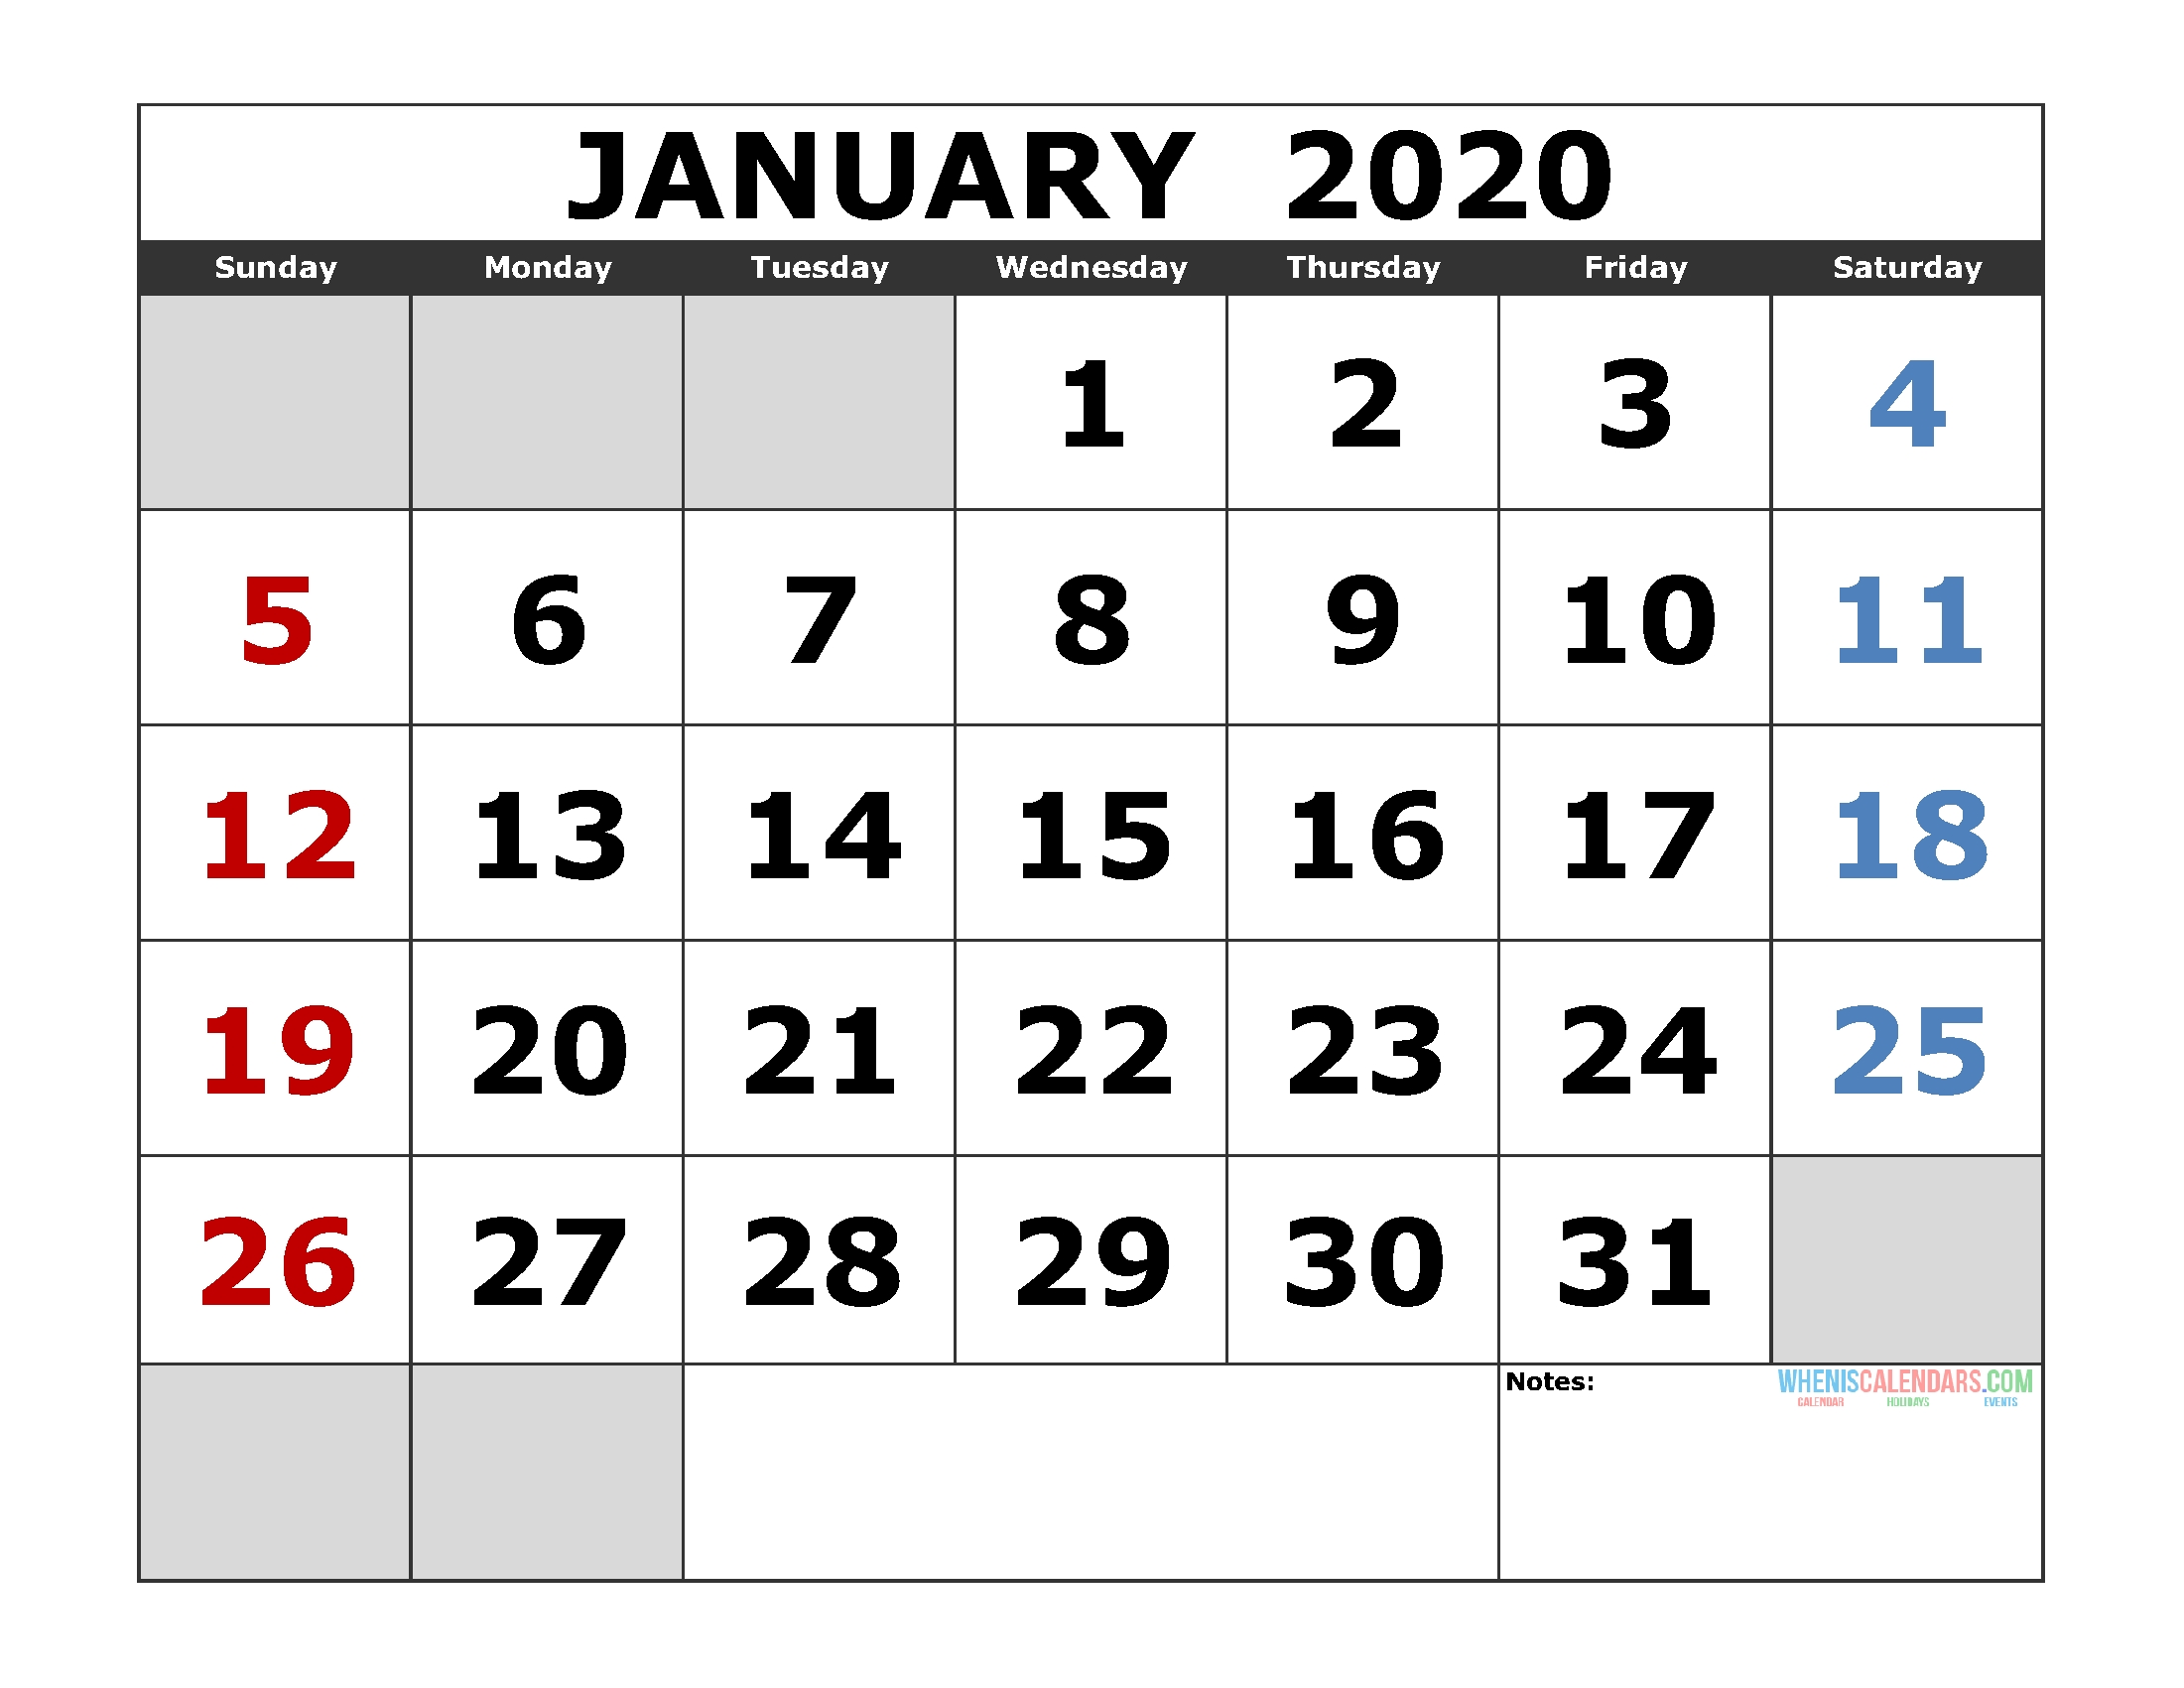 January 2020 Printable Calendar Template Excel, Pdf, Image